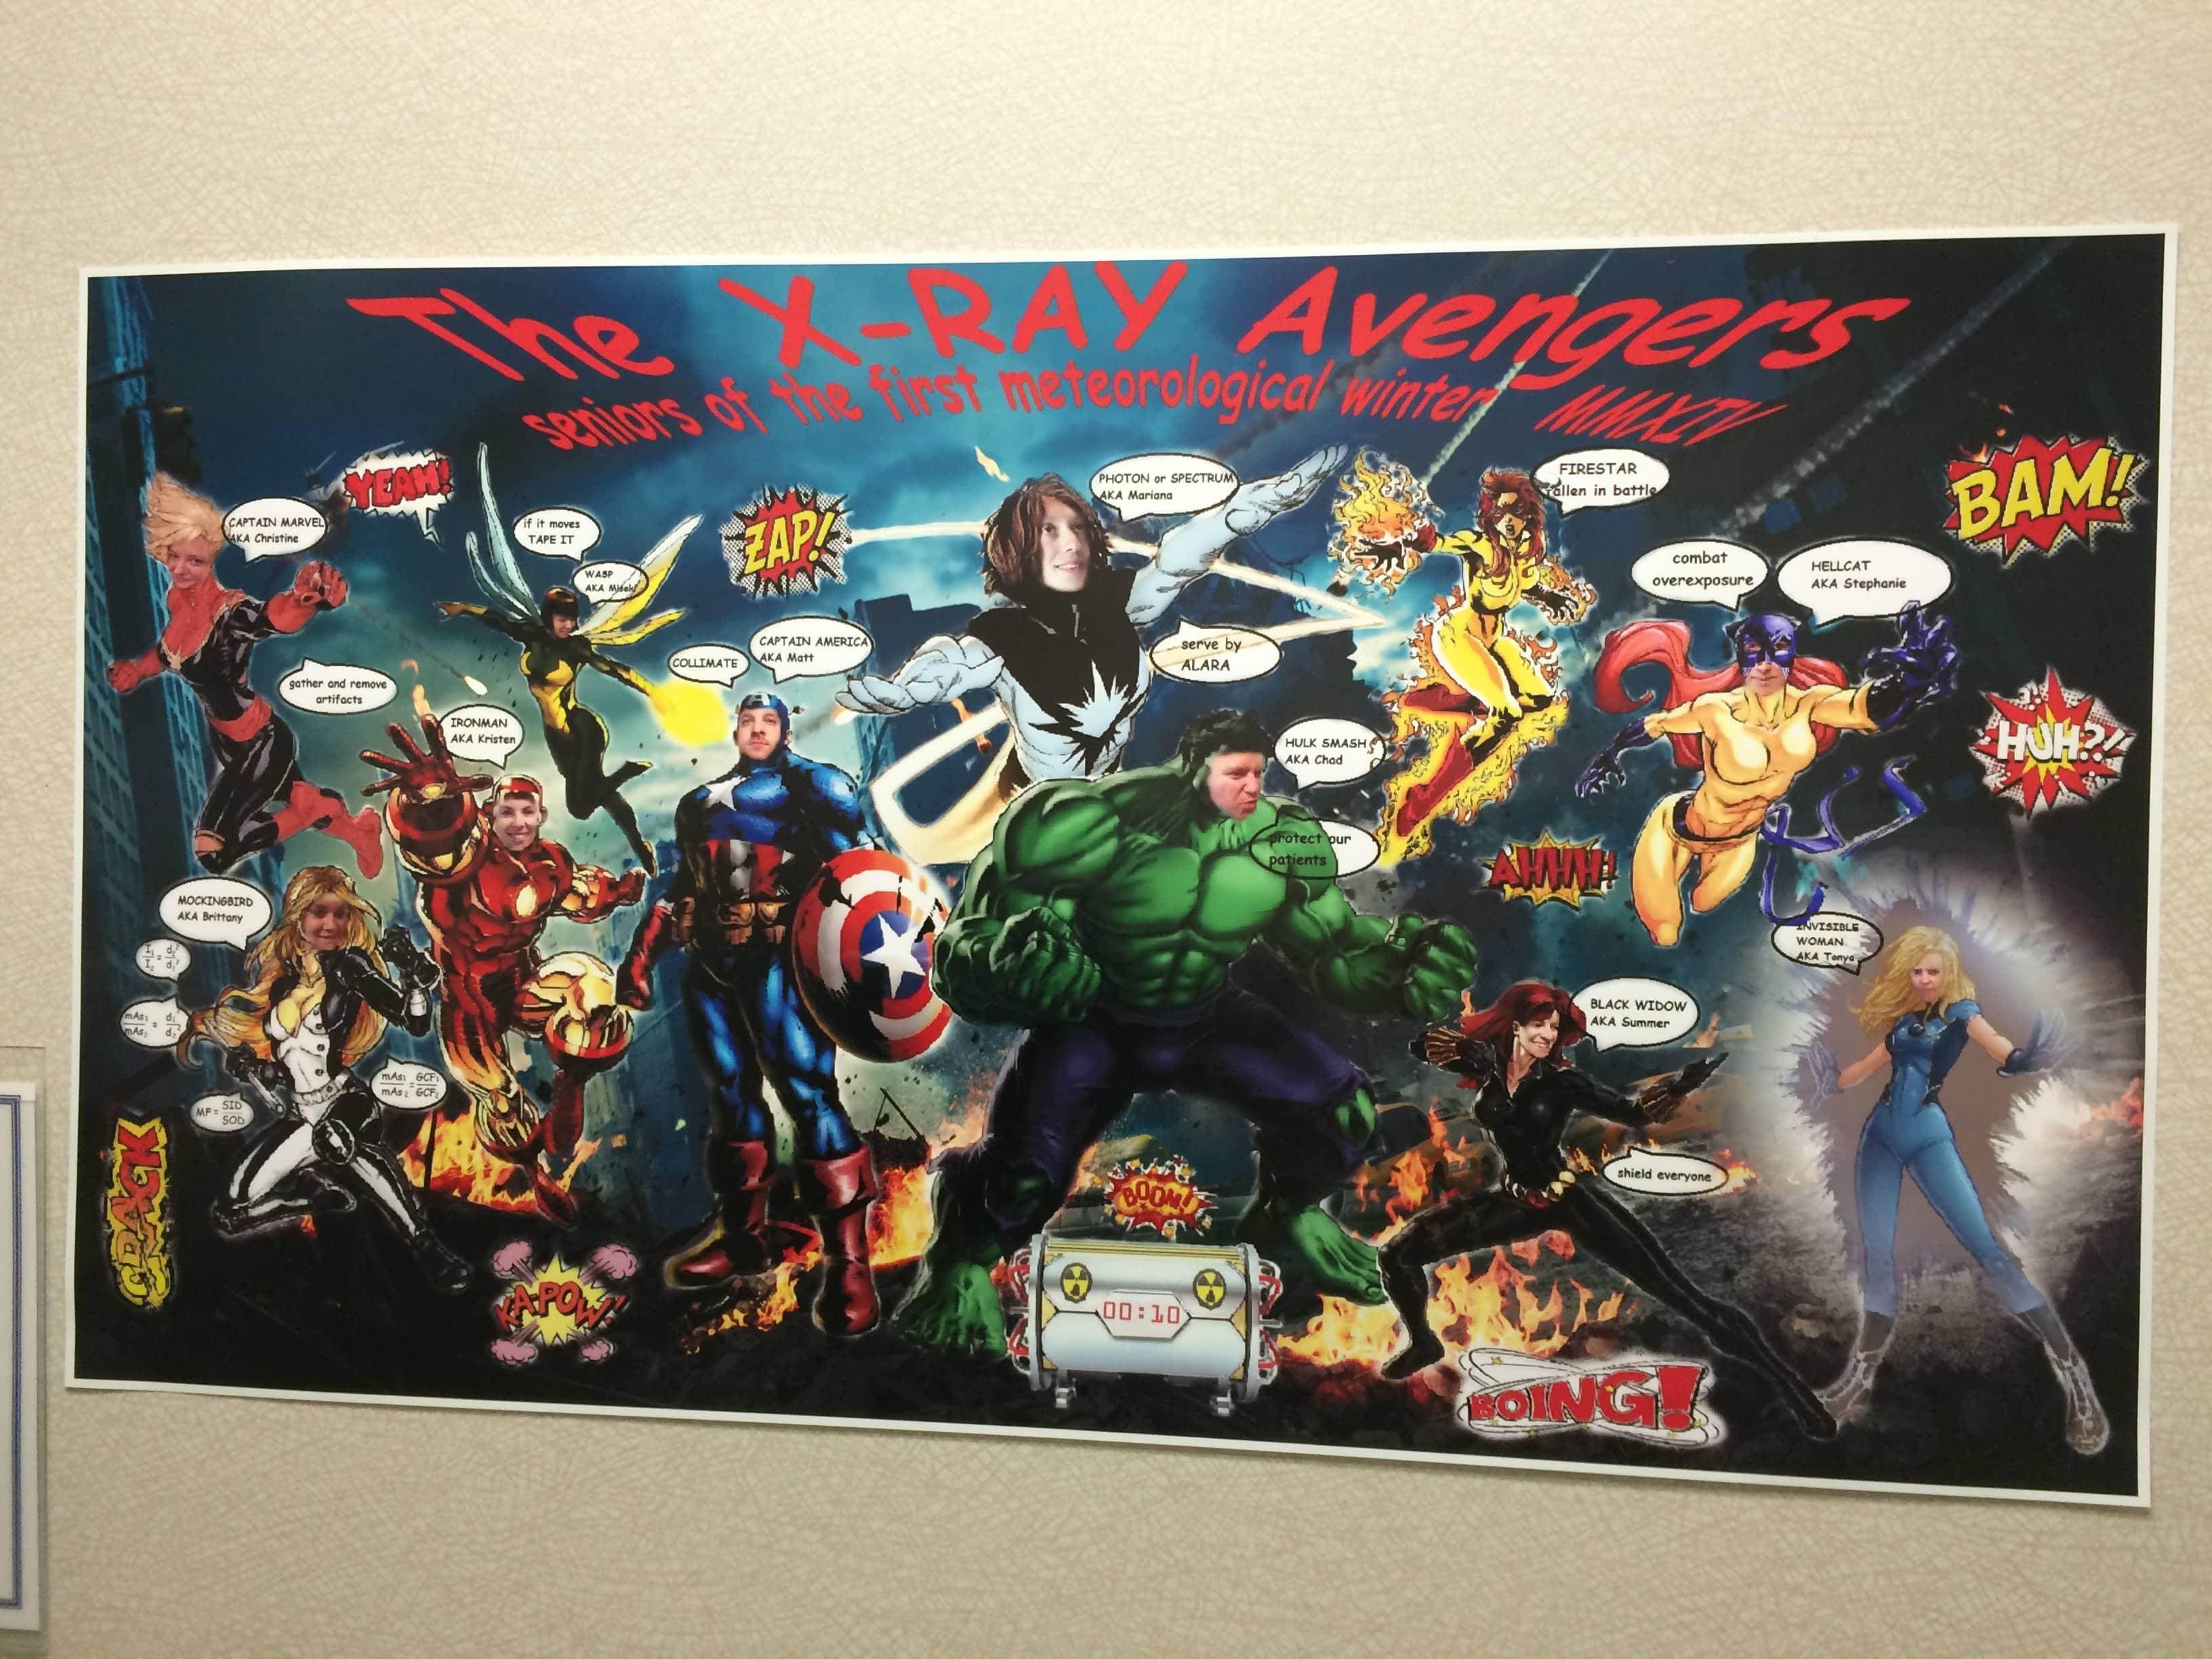 Avengers Assemble in Sarasota